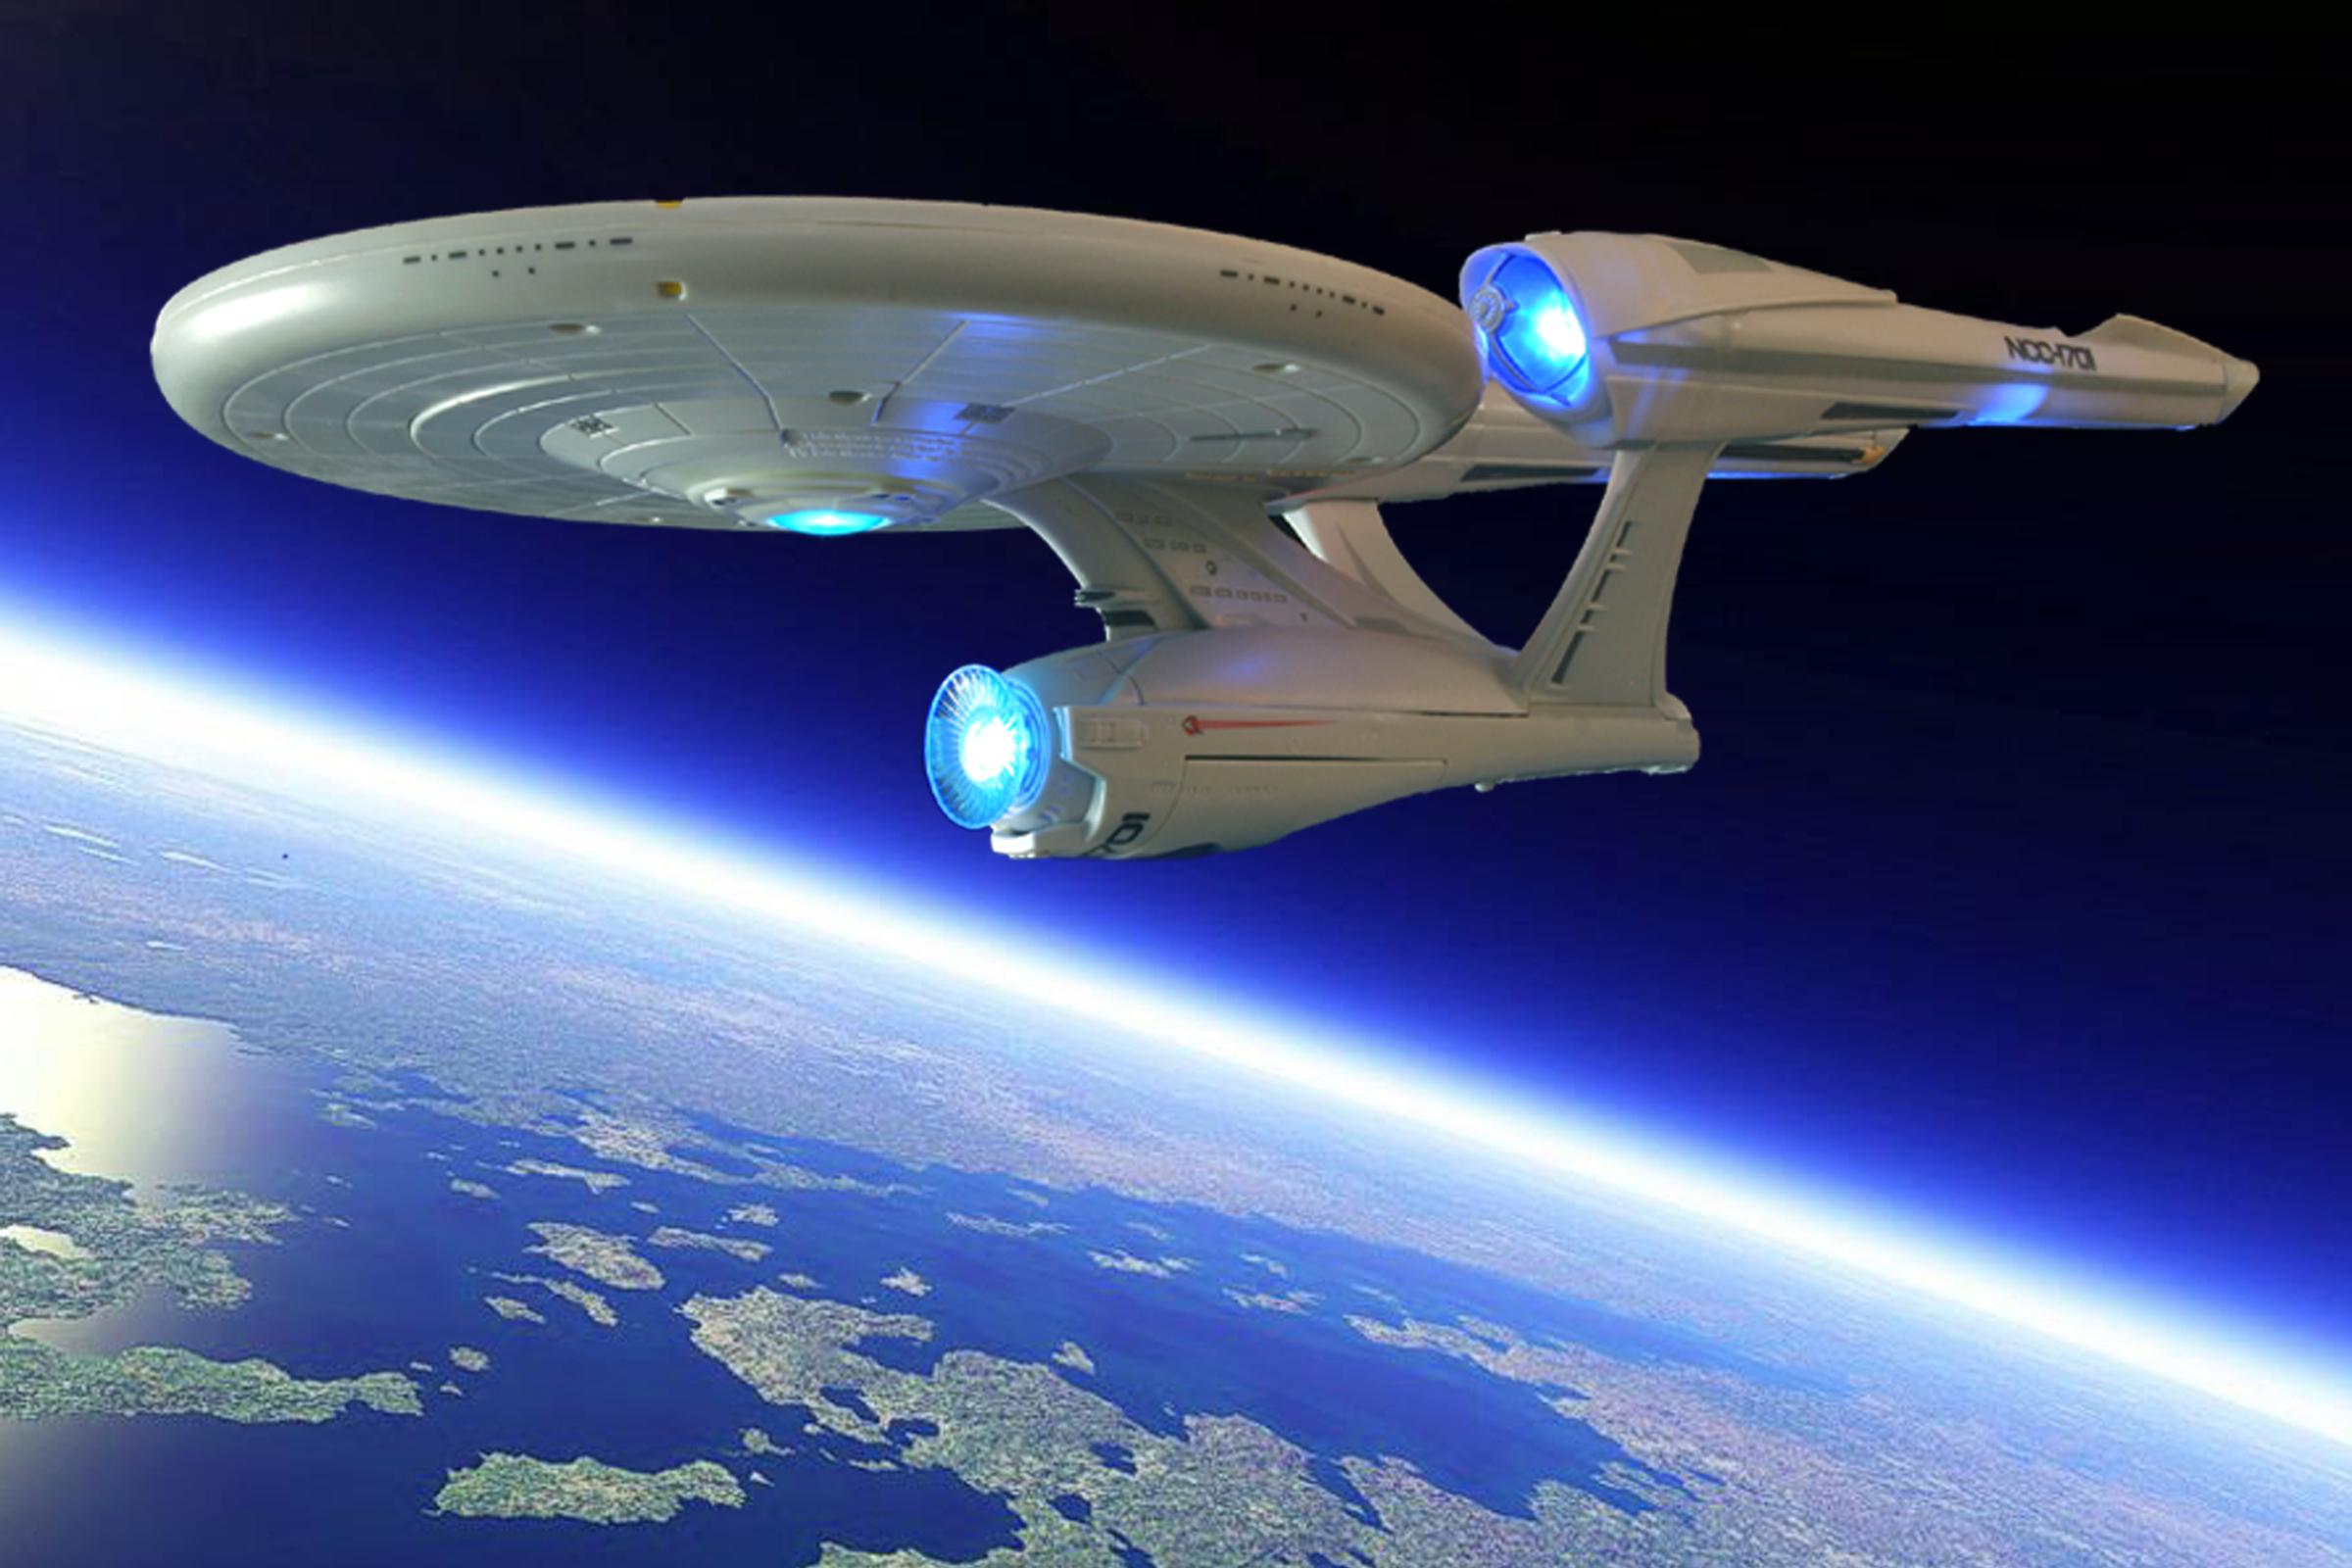 Wallpaper Startrek Enterprise Starship Playmates